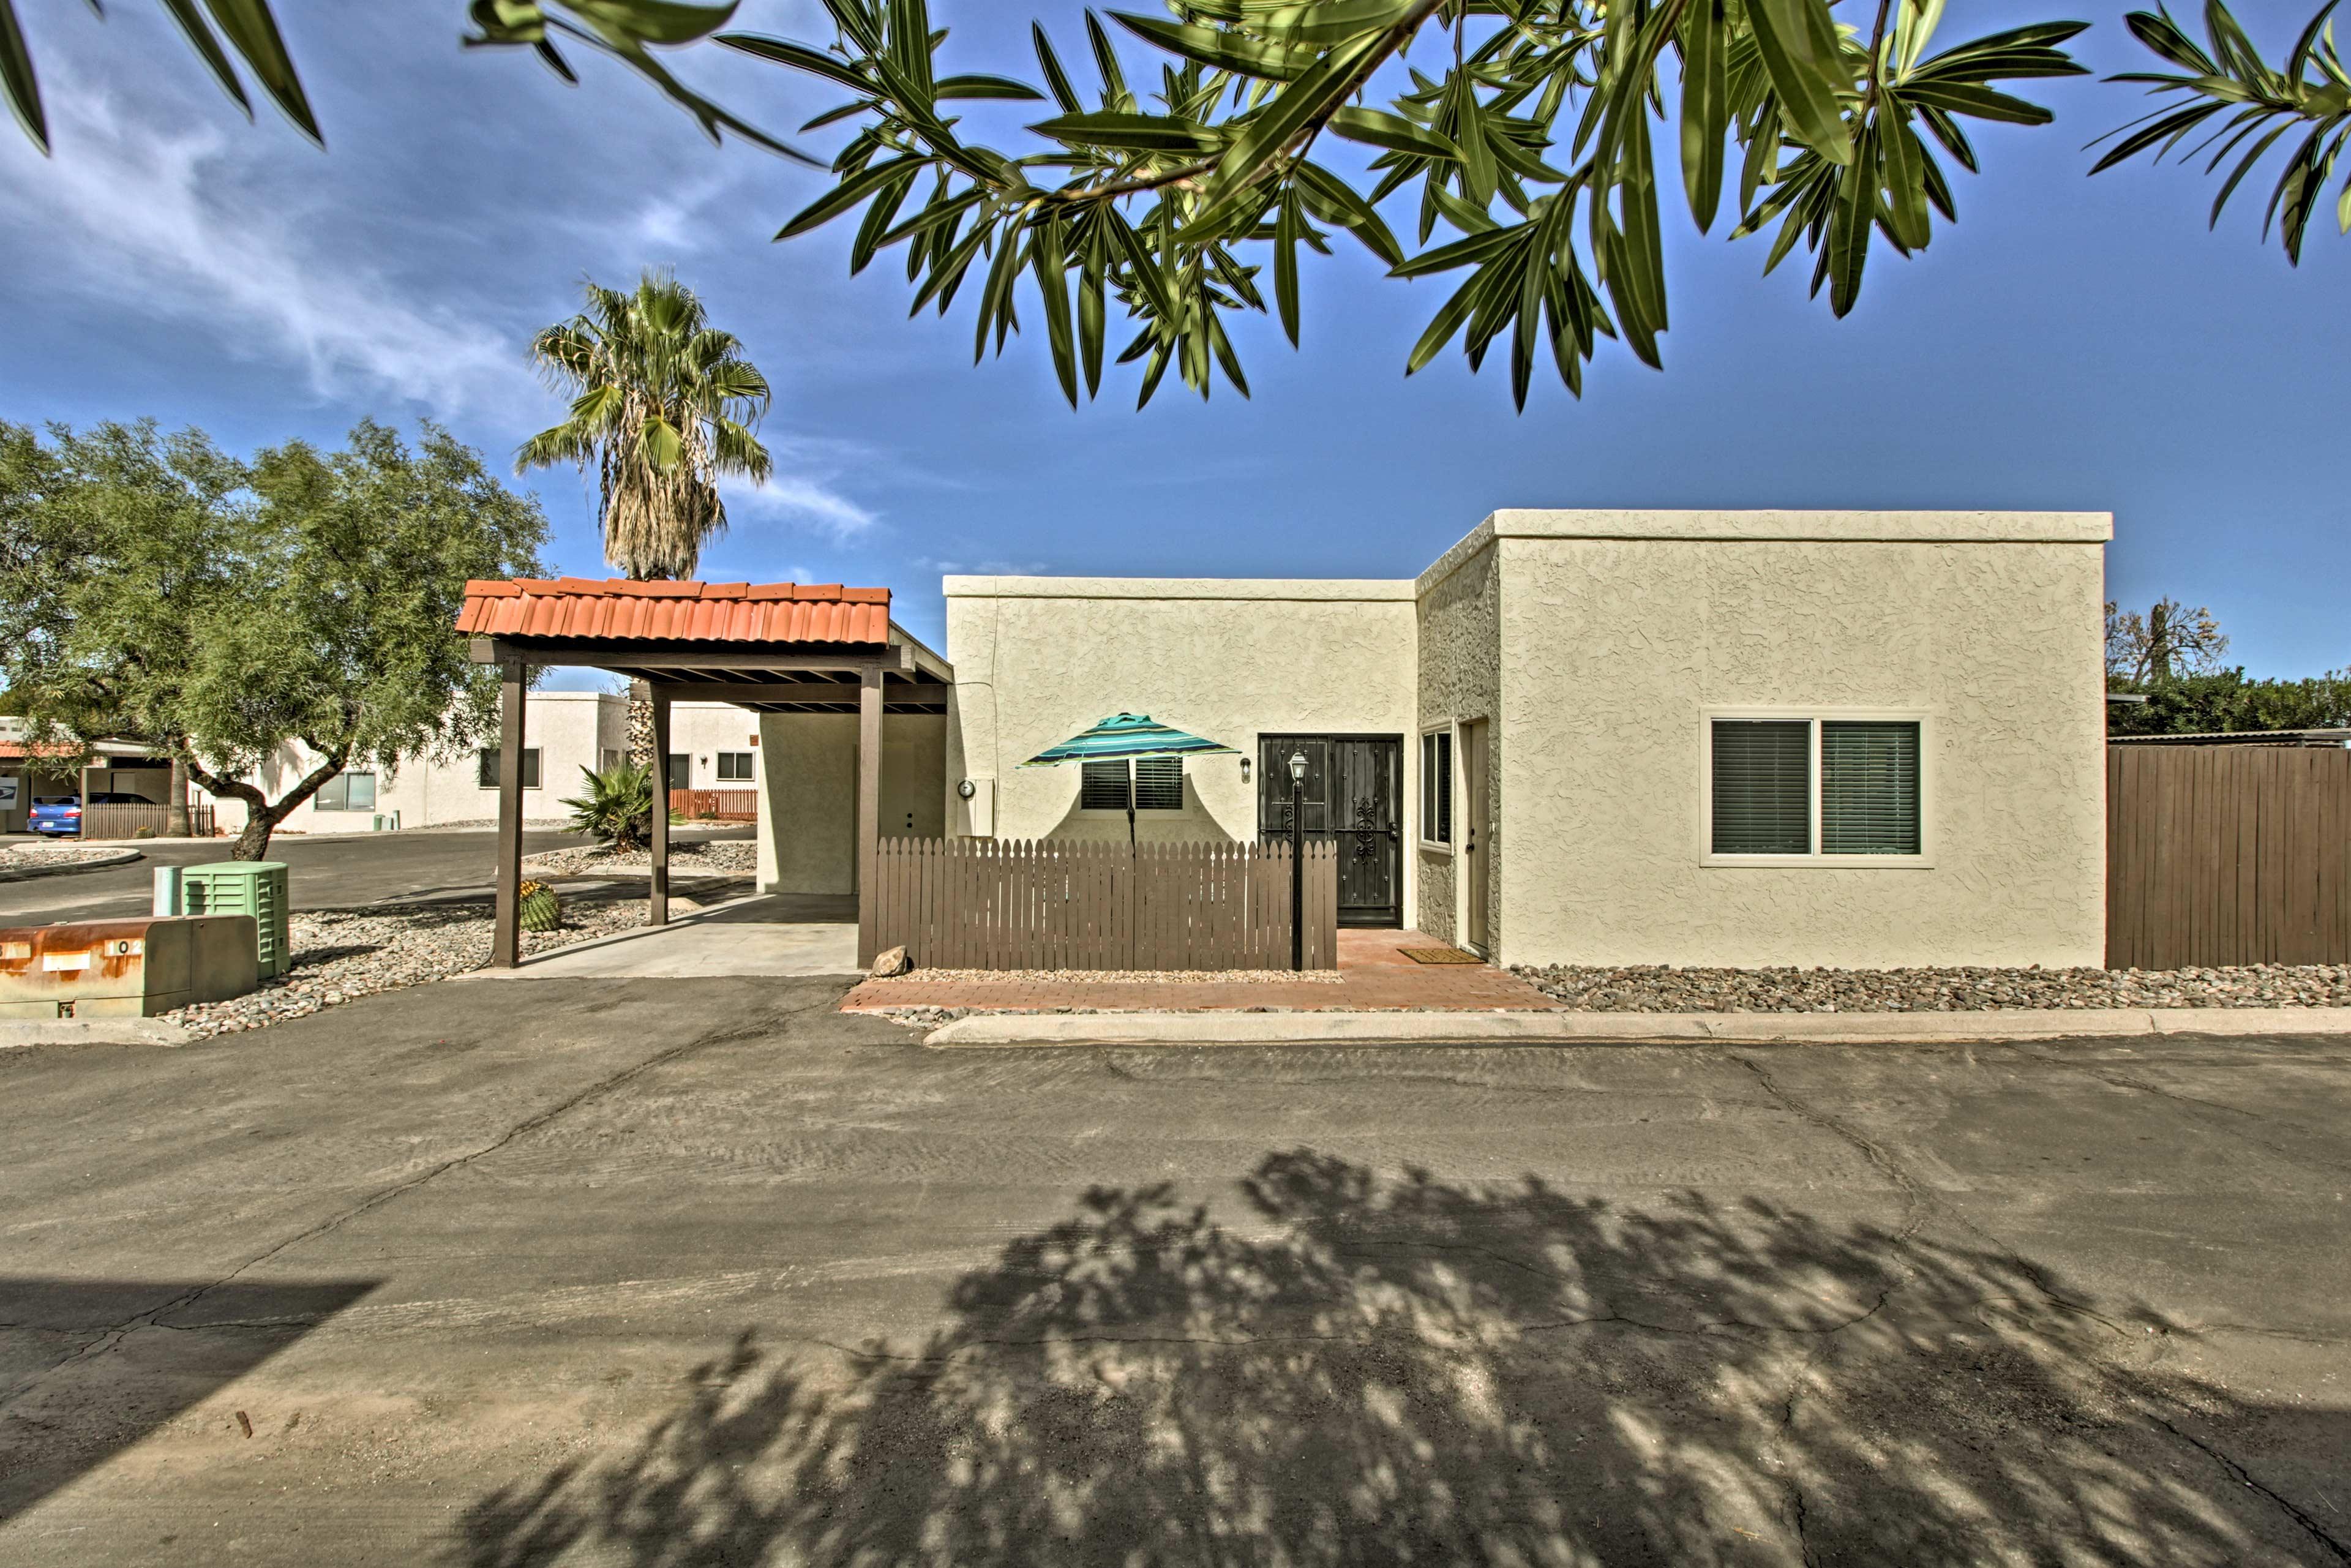 This stucco house boasts an Arizona atmosphere to make you feel like a local.